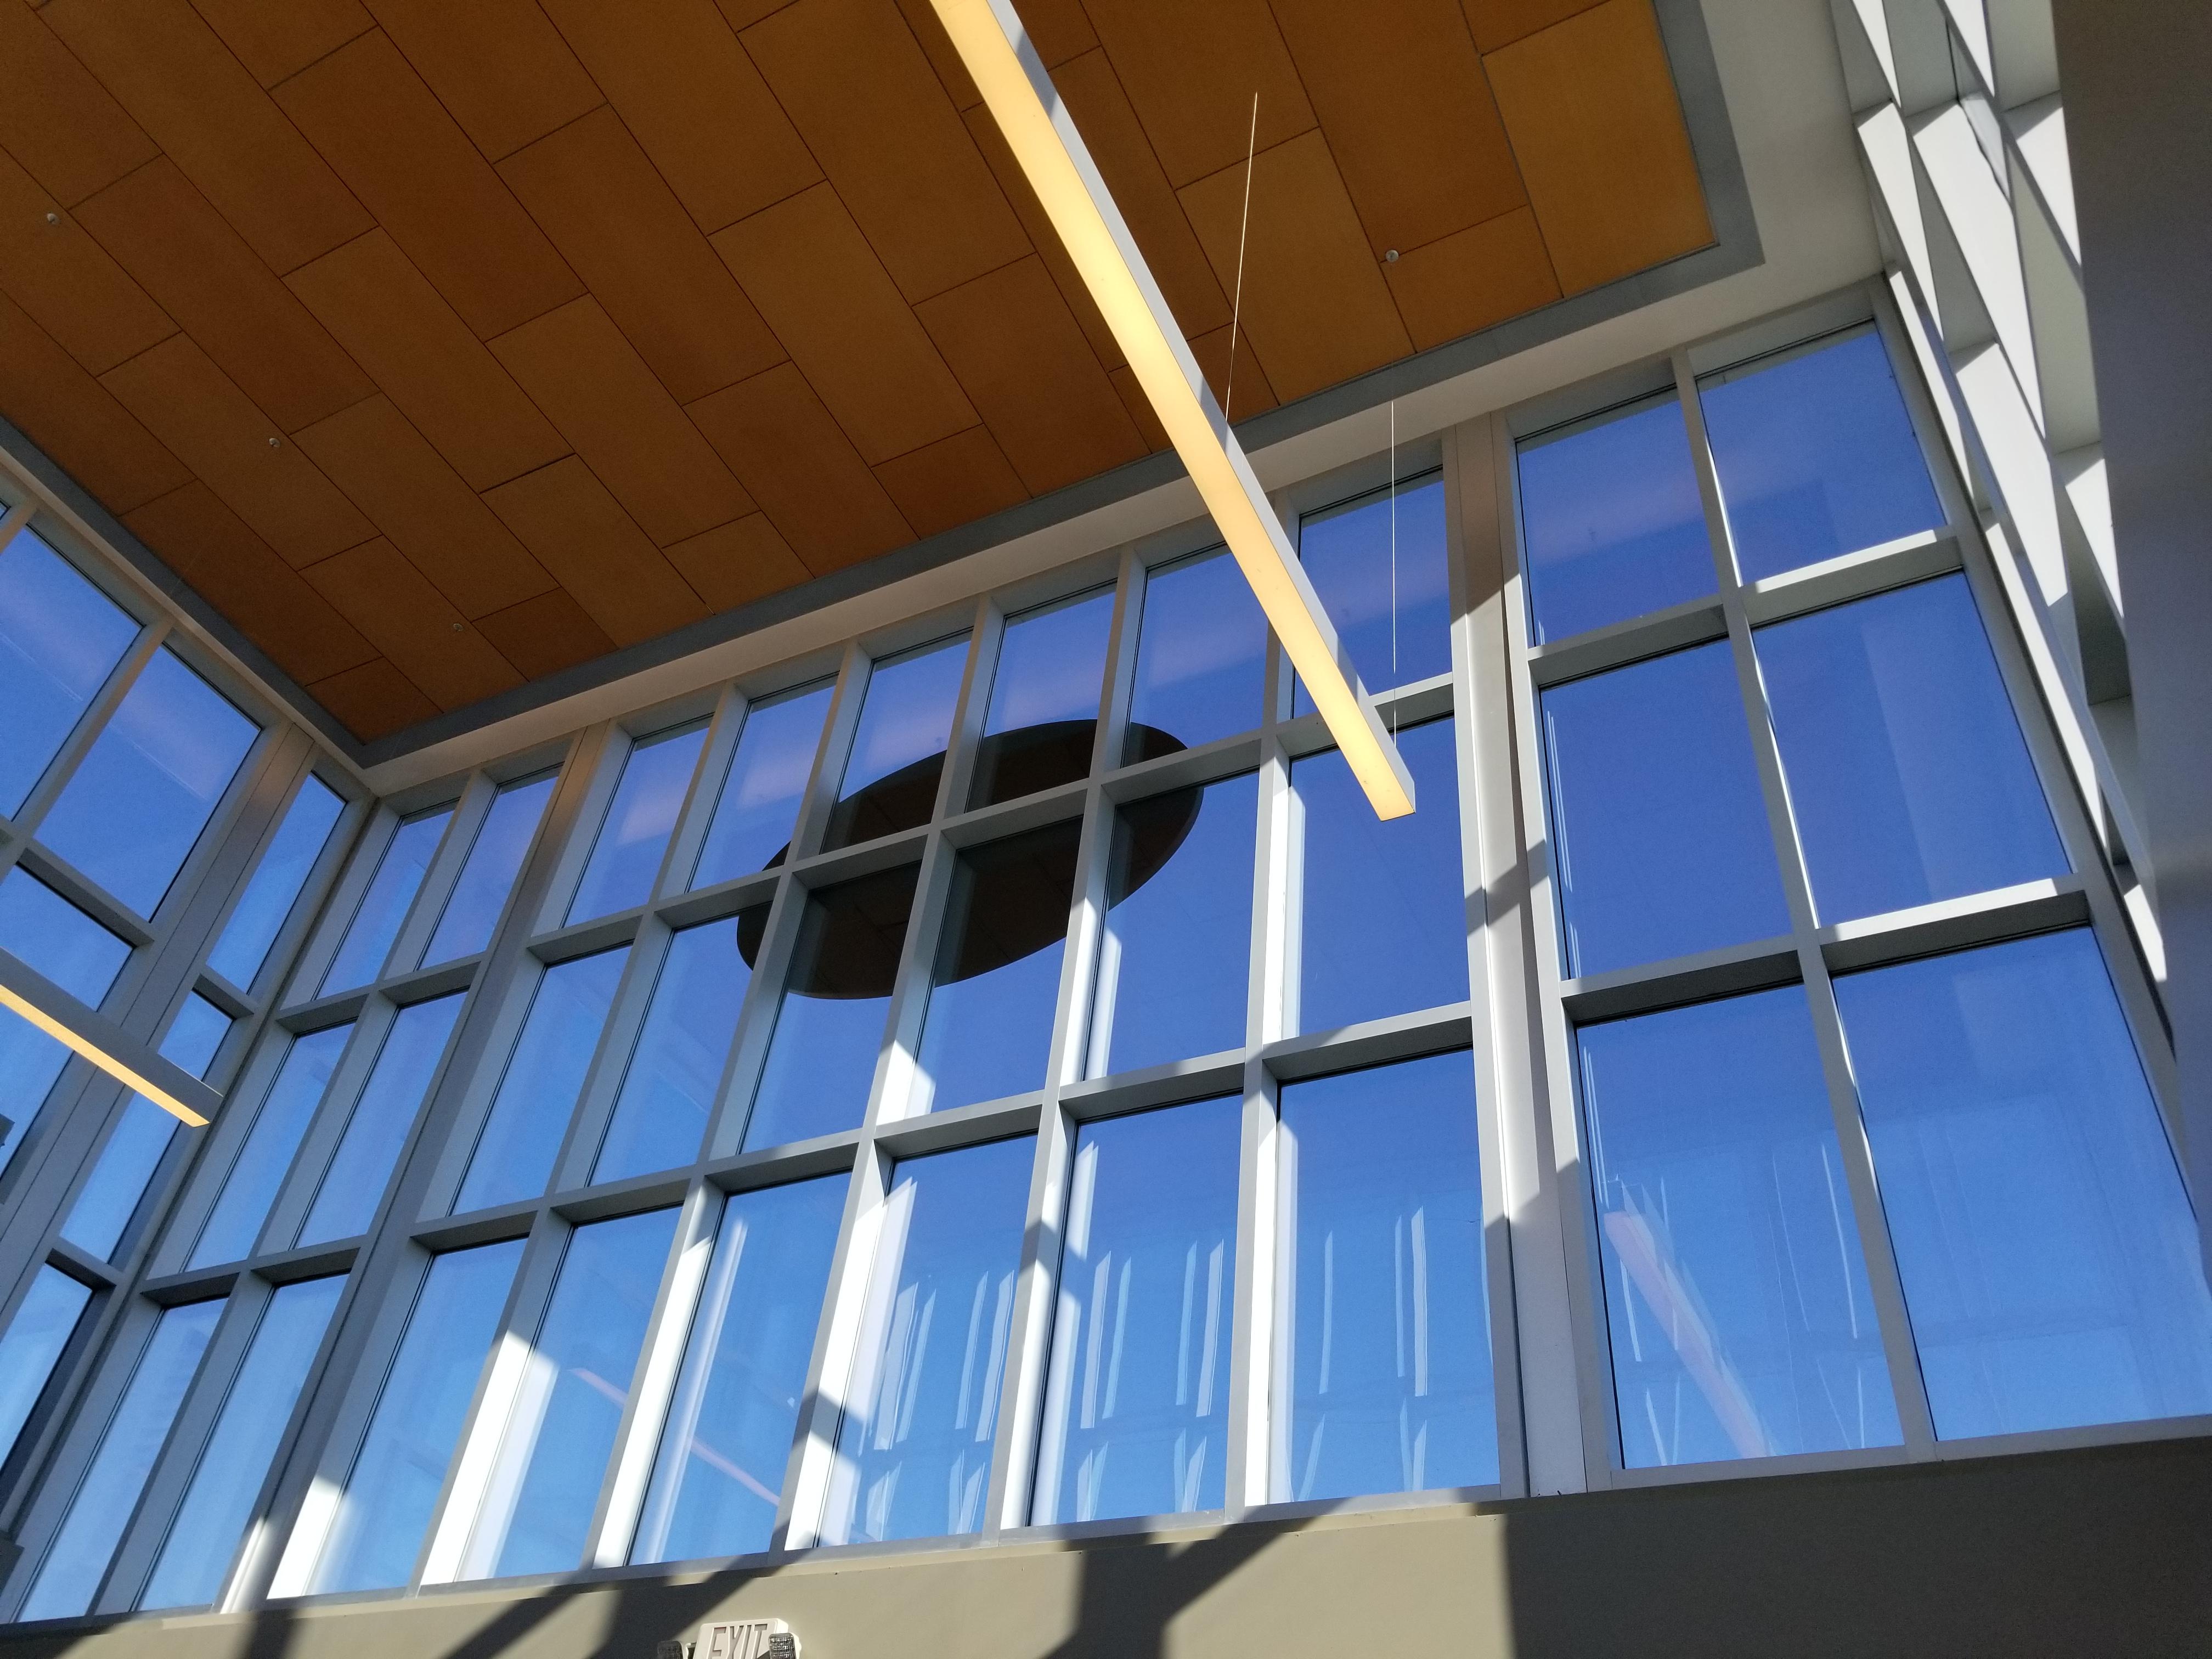 Clear Anodized Flat Sheet - allon Gateway Shopping Center